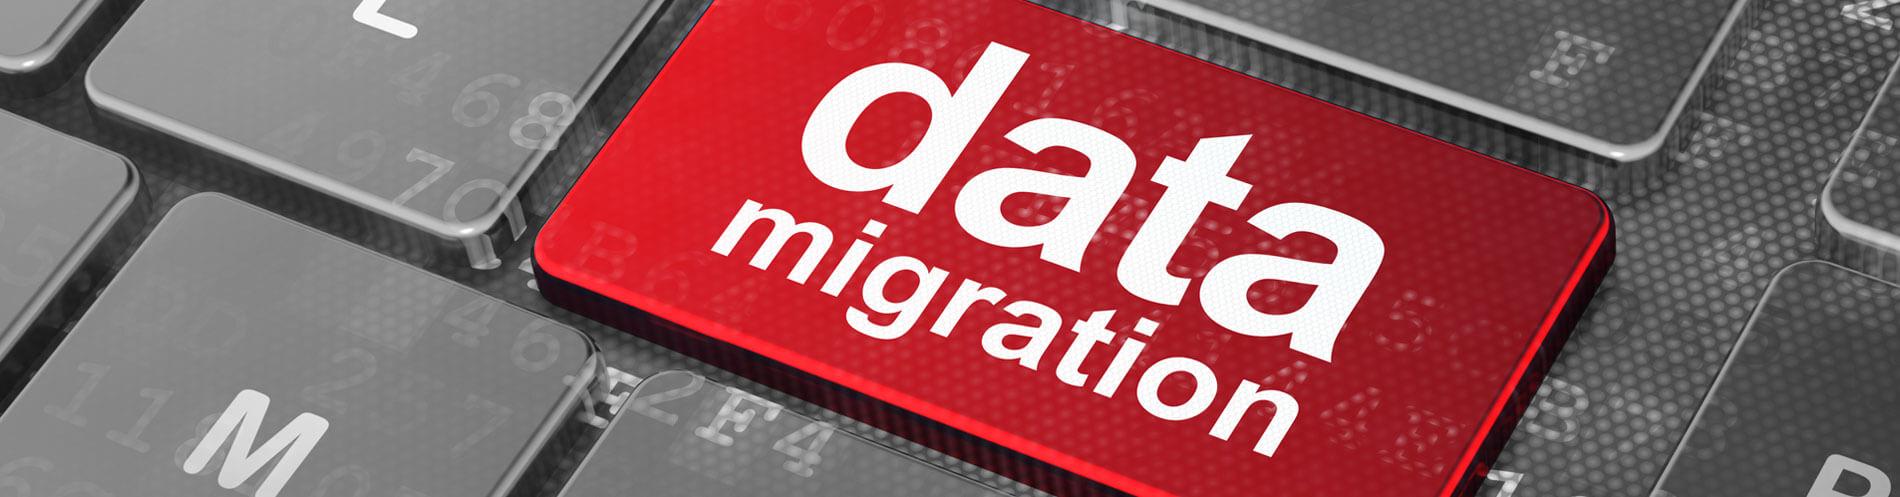 Migration/ Upgradation